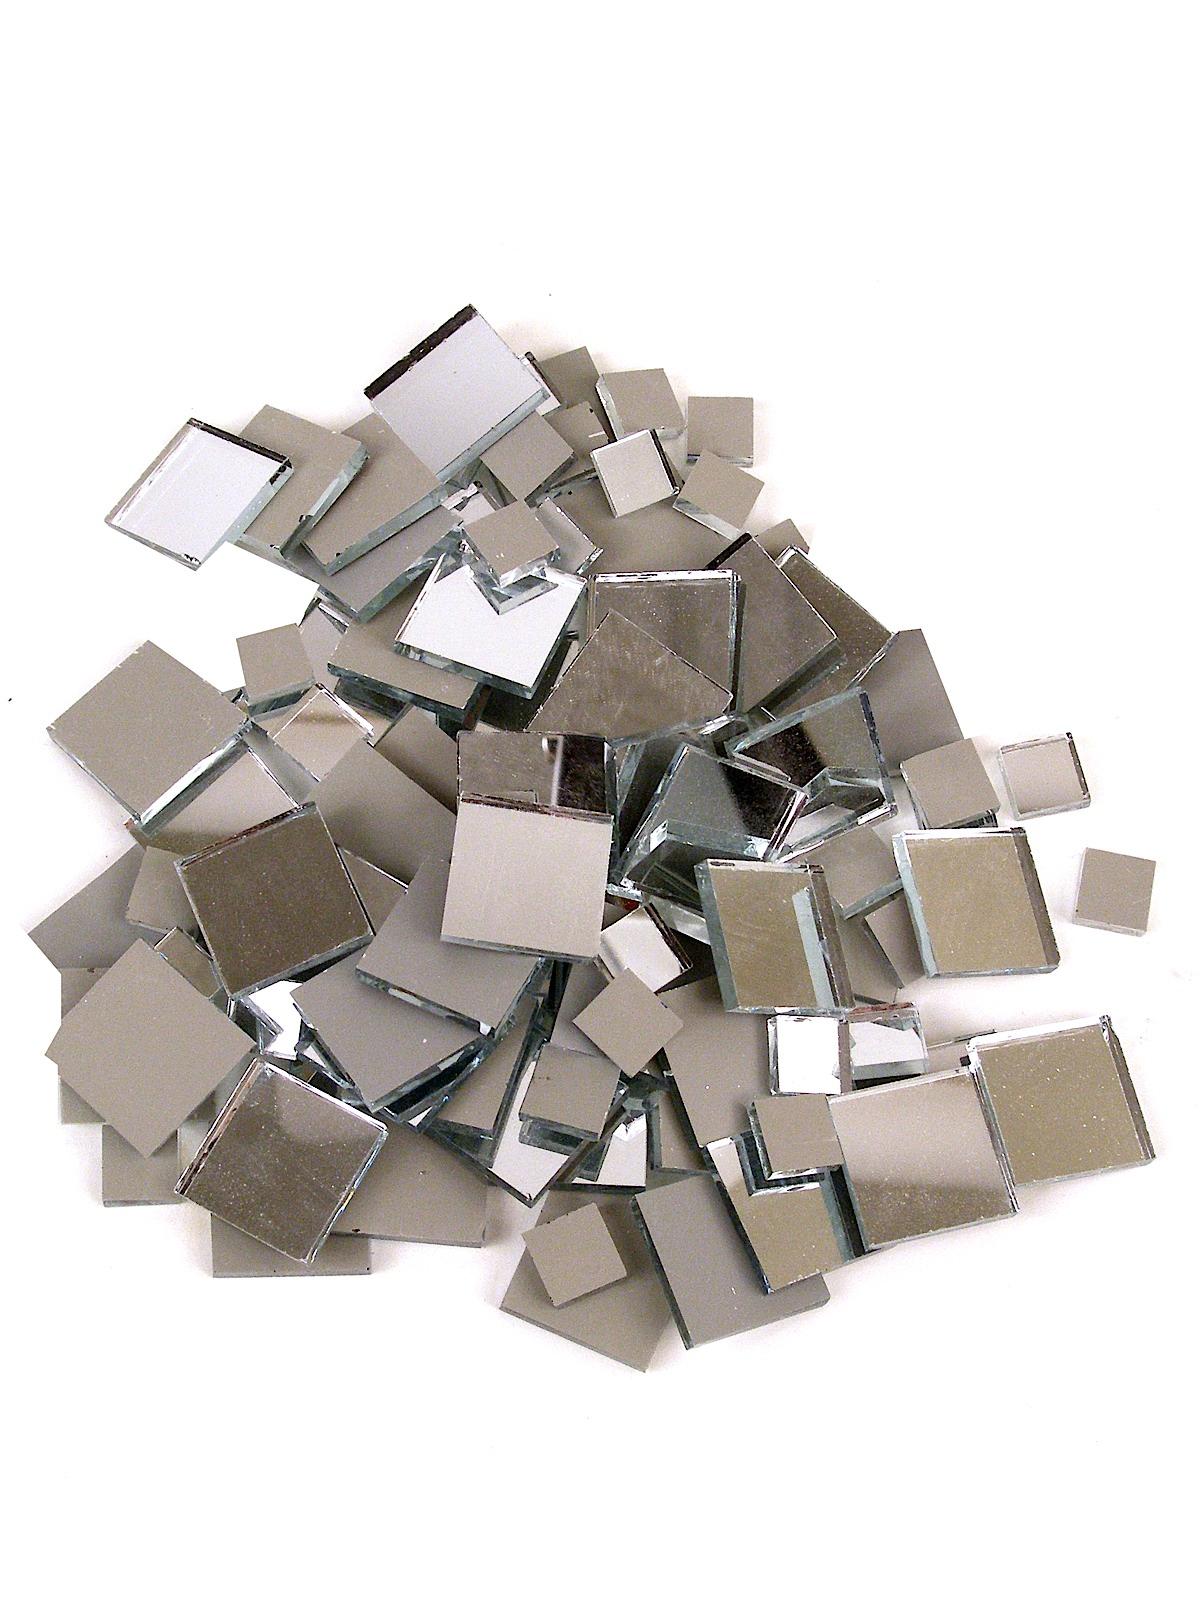 Mosaic Mercantile - Mirrored Glass Tile